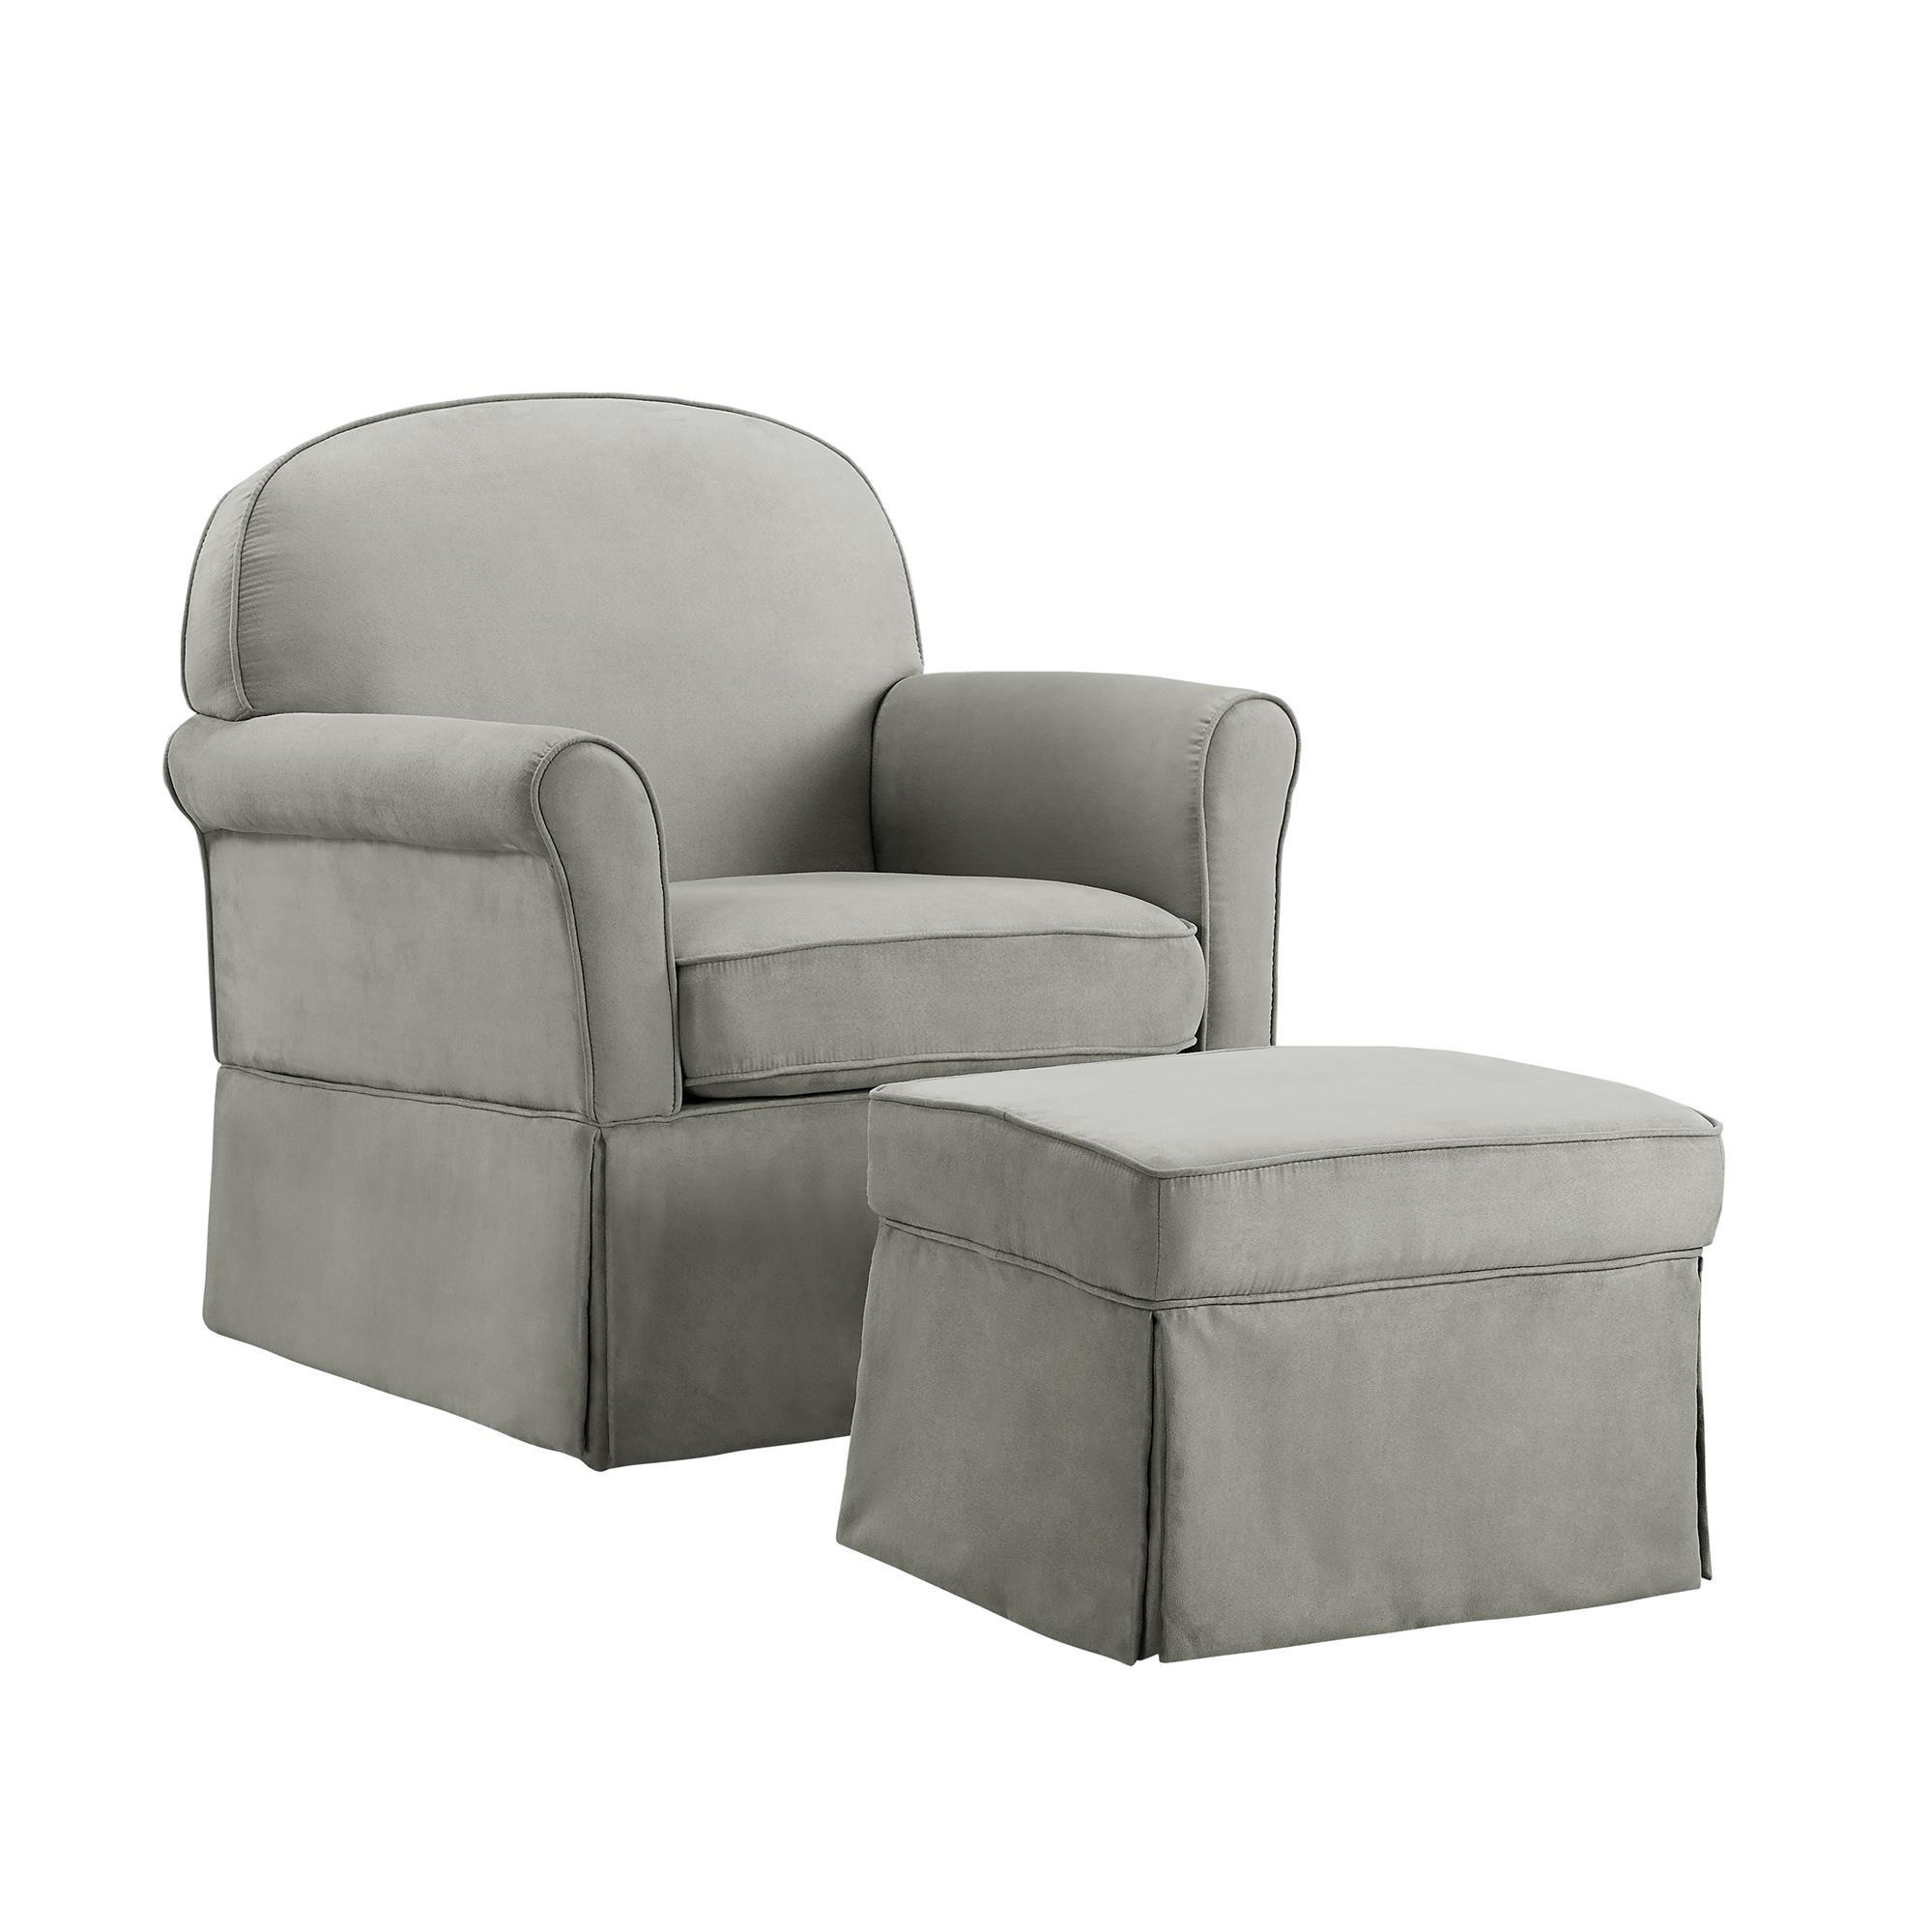 Baby Relax Swivel Glider and Ottoman Set, Light Grey